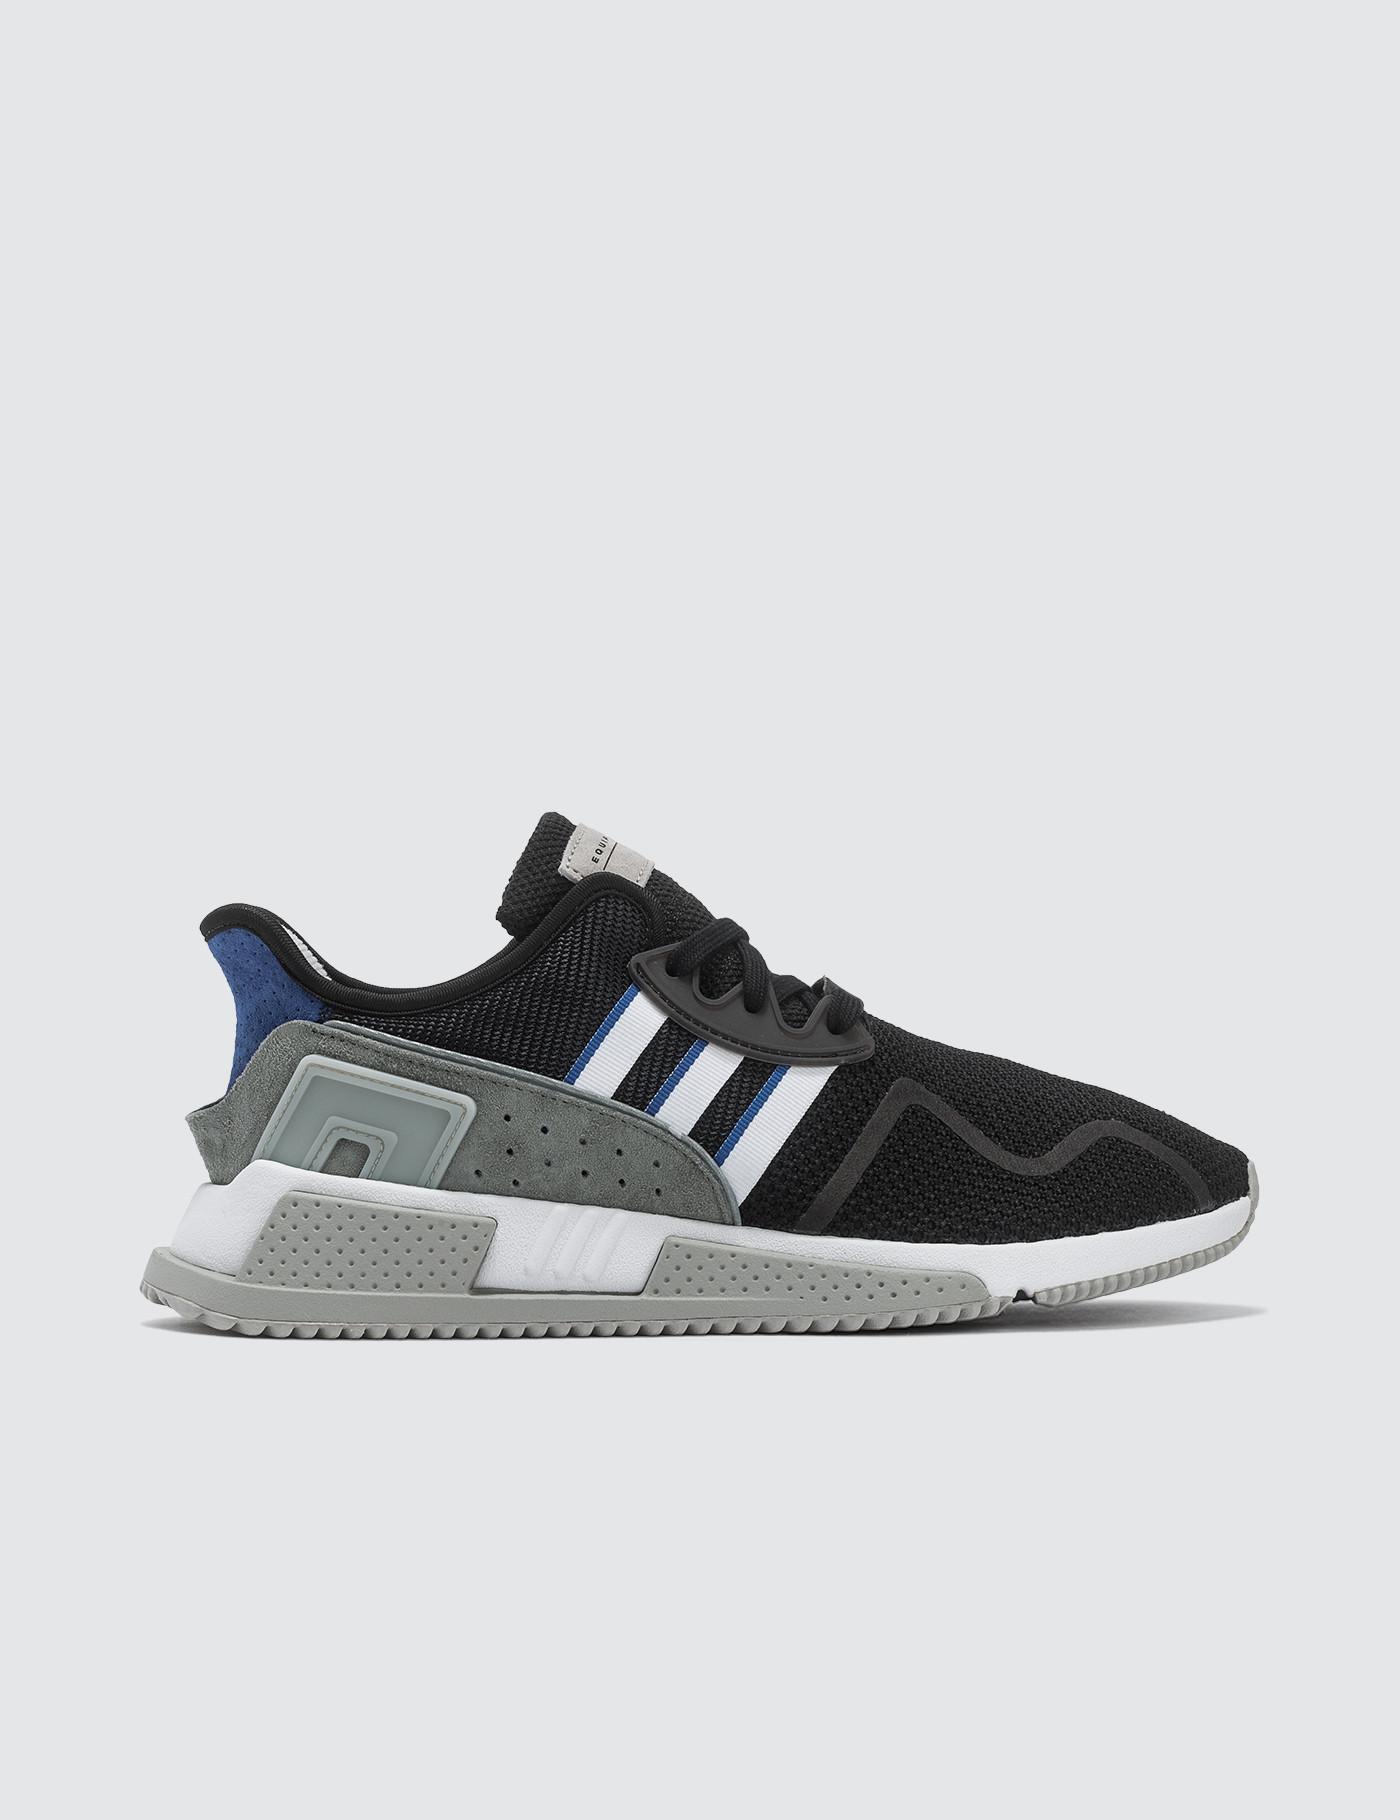 ff44f4ce81c4 Lyst - Adidas Originals Eqt Cushion Adv in Black for Men